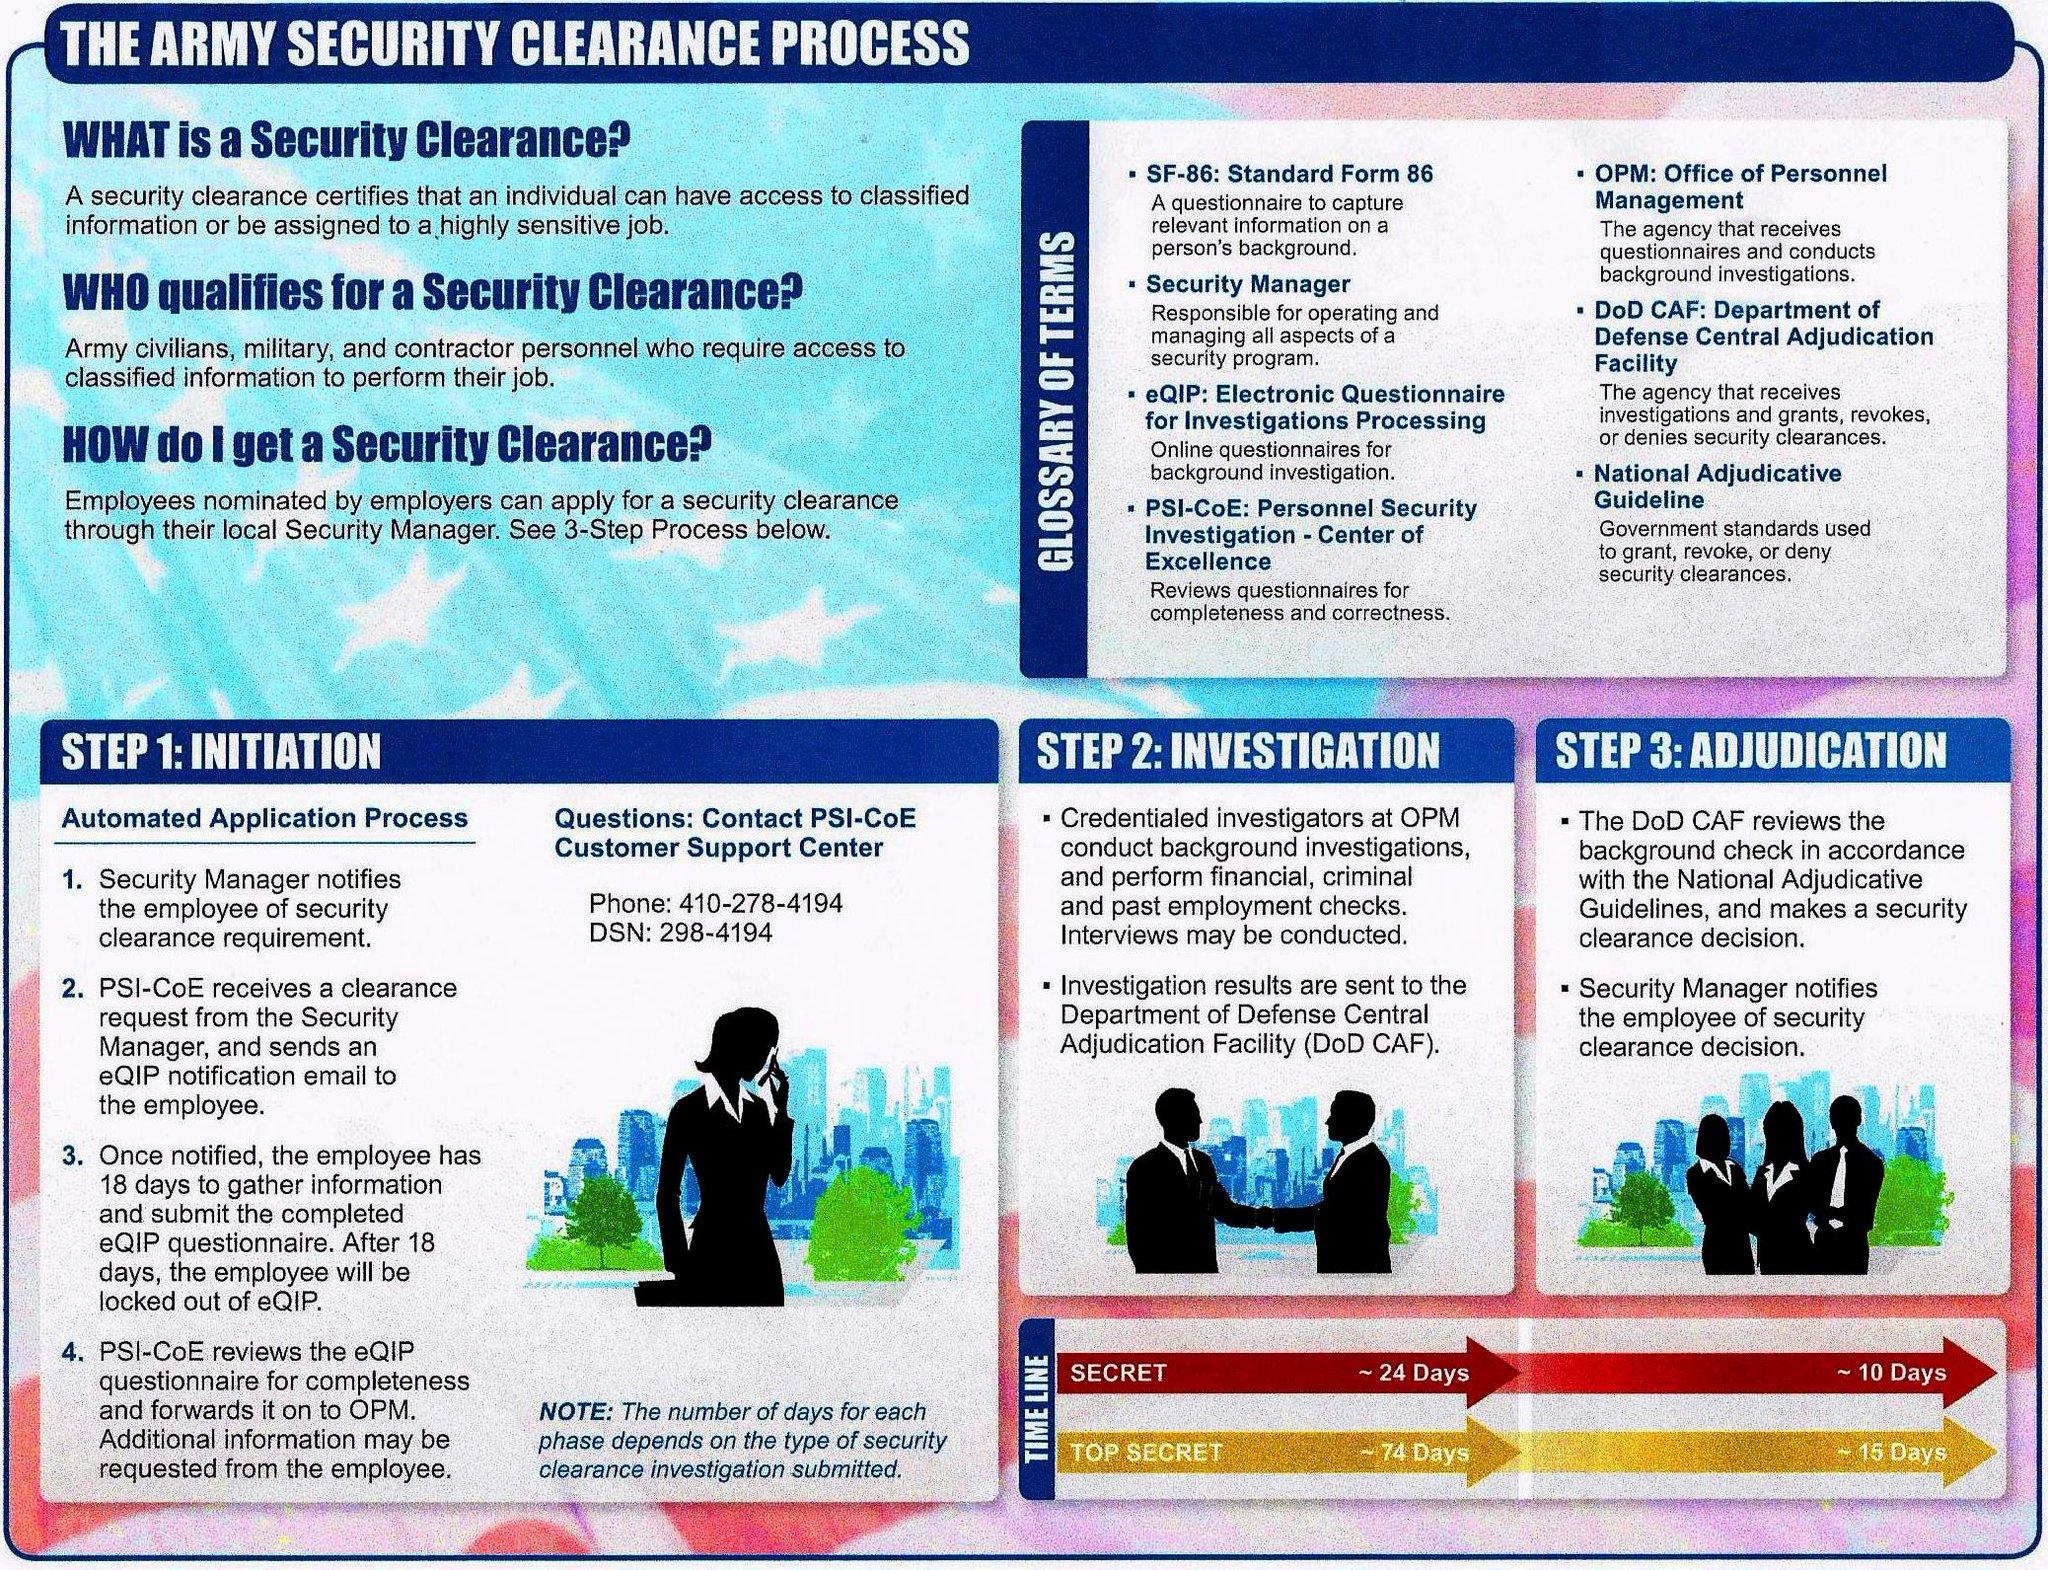 DCSecurityClearanceConsultants on Twitter: